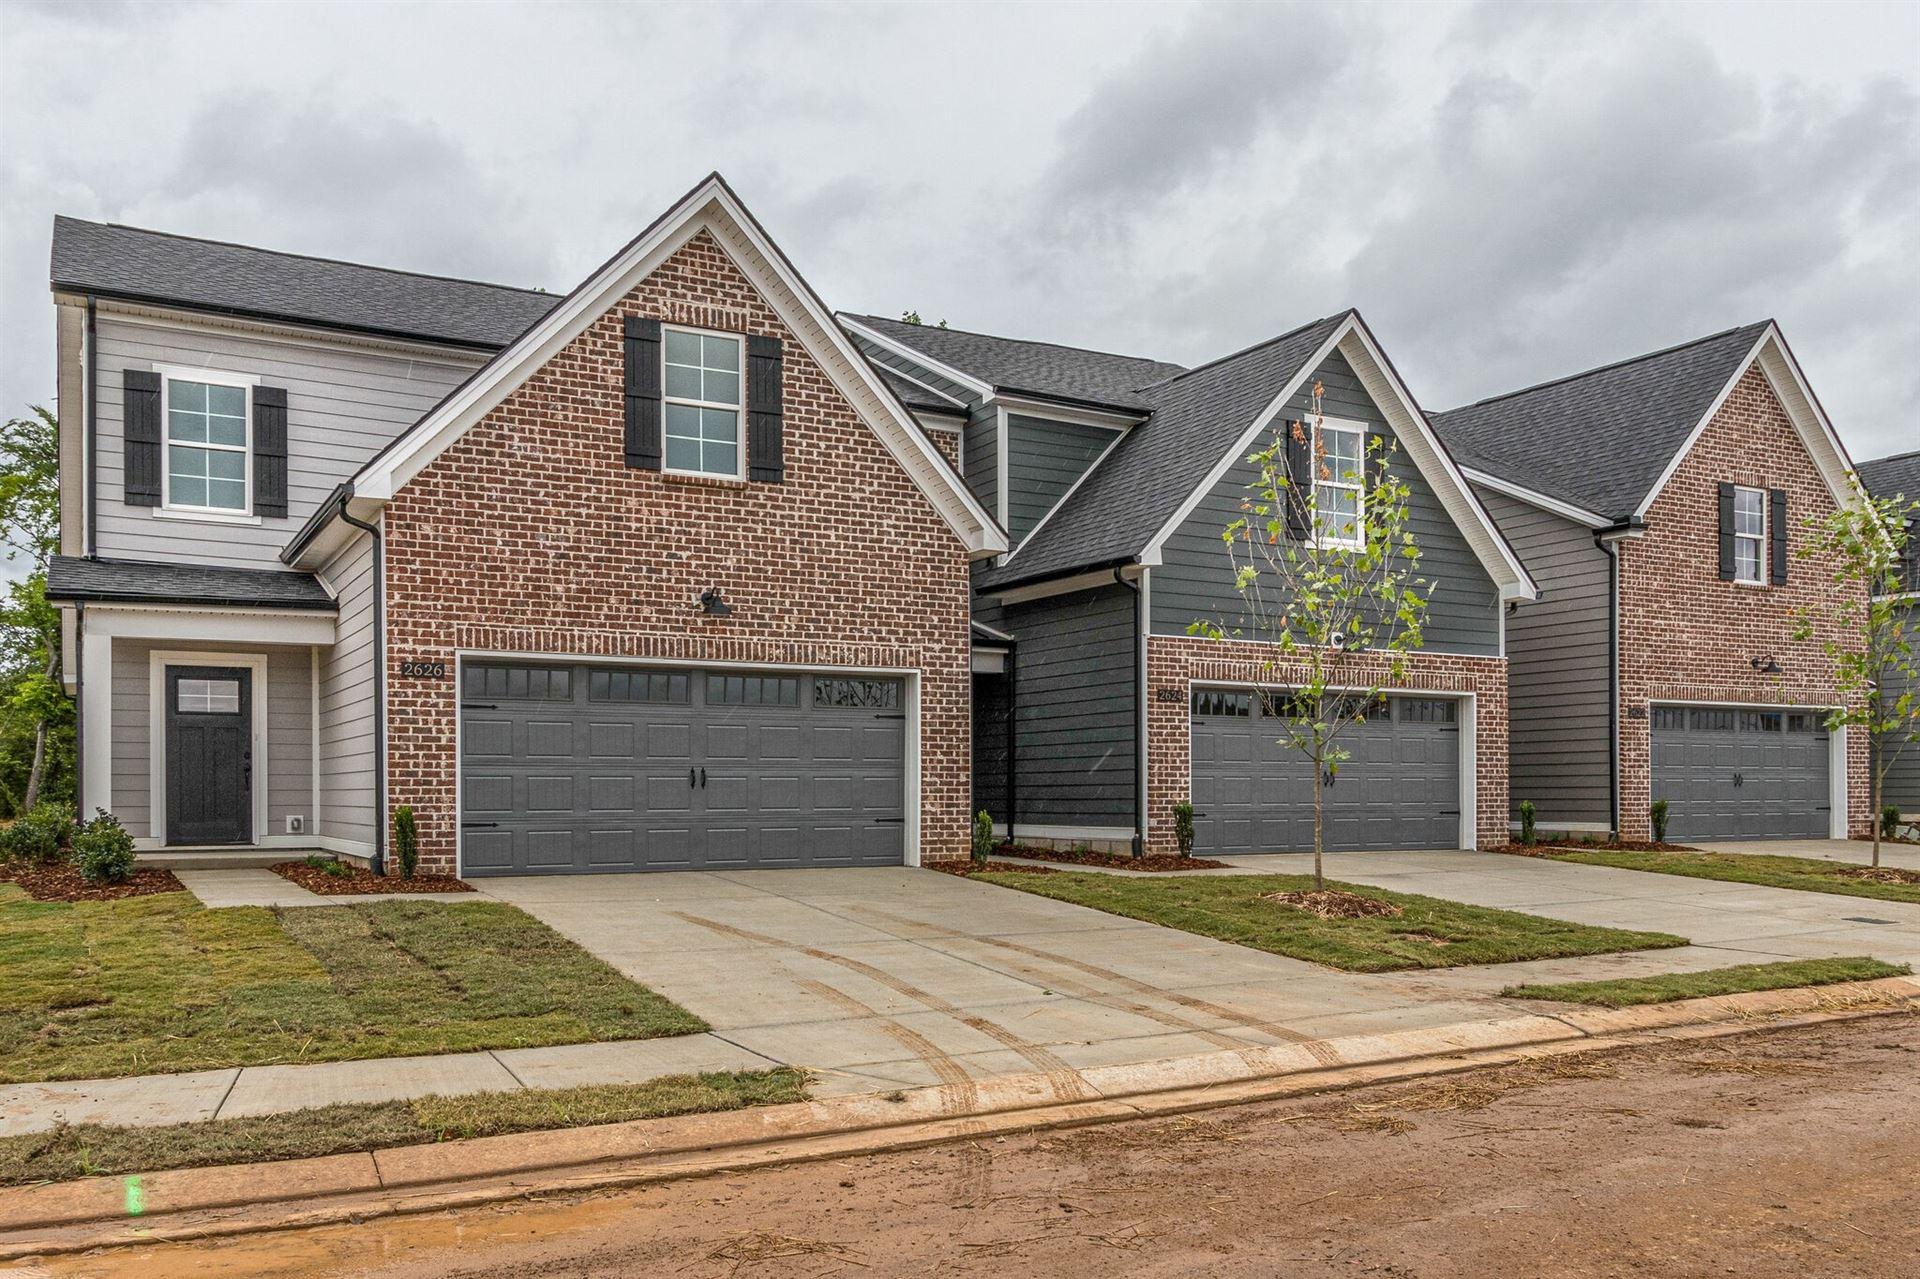 2621 Leawood Ct #30, Murfreesboro, TN 37128 - MLS#: 2286394